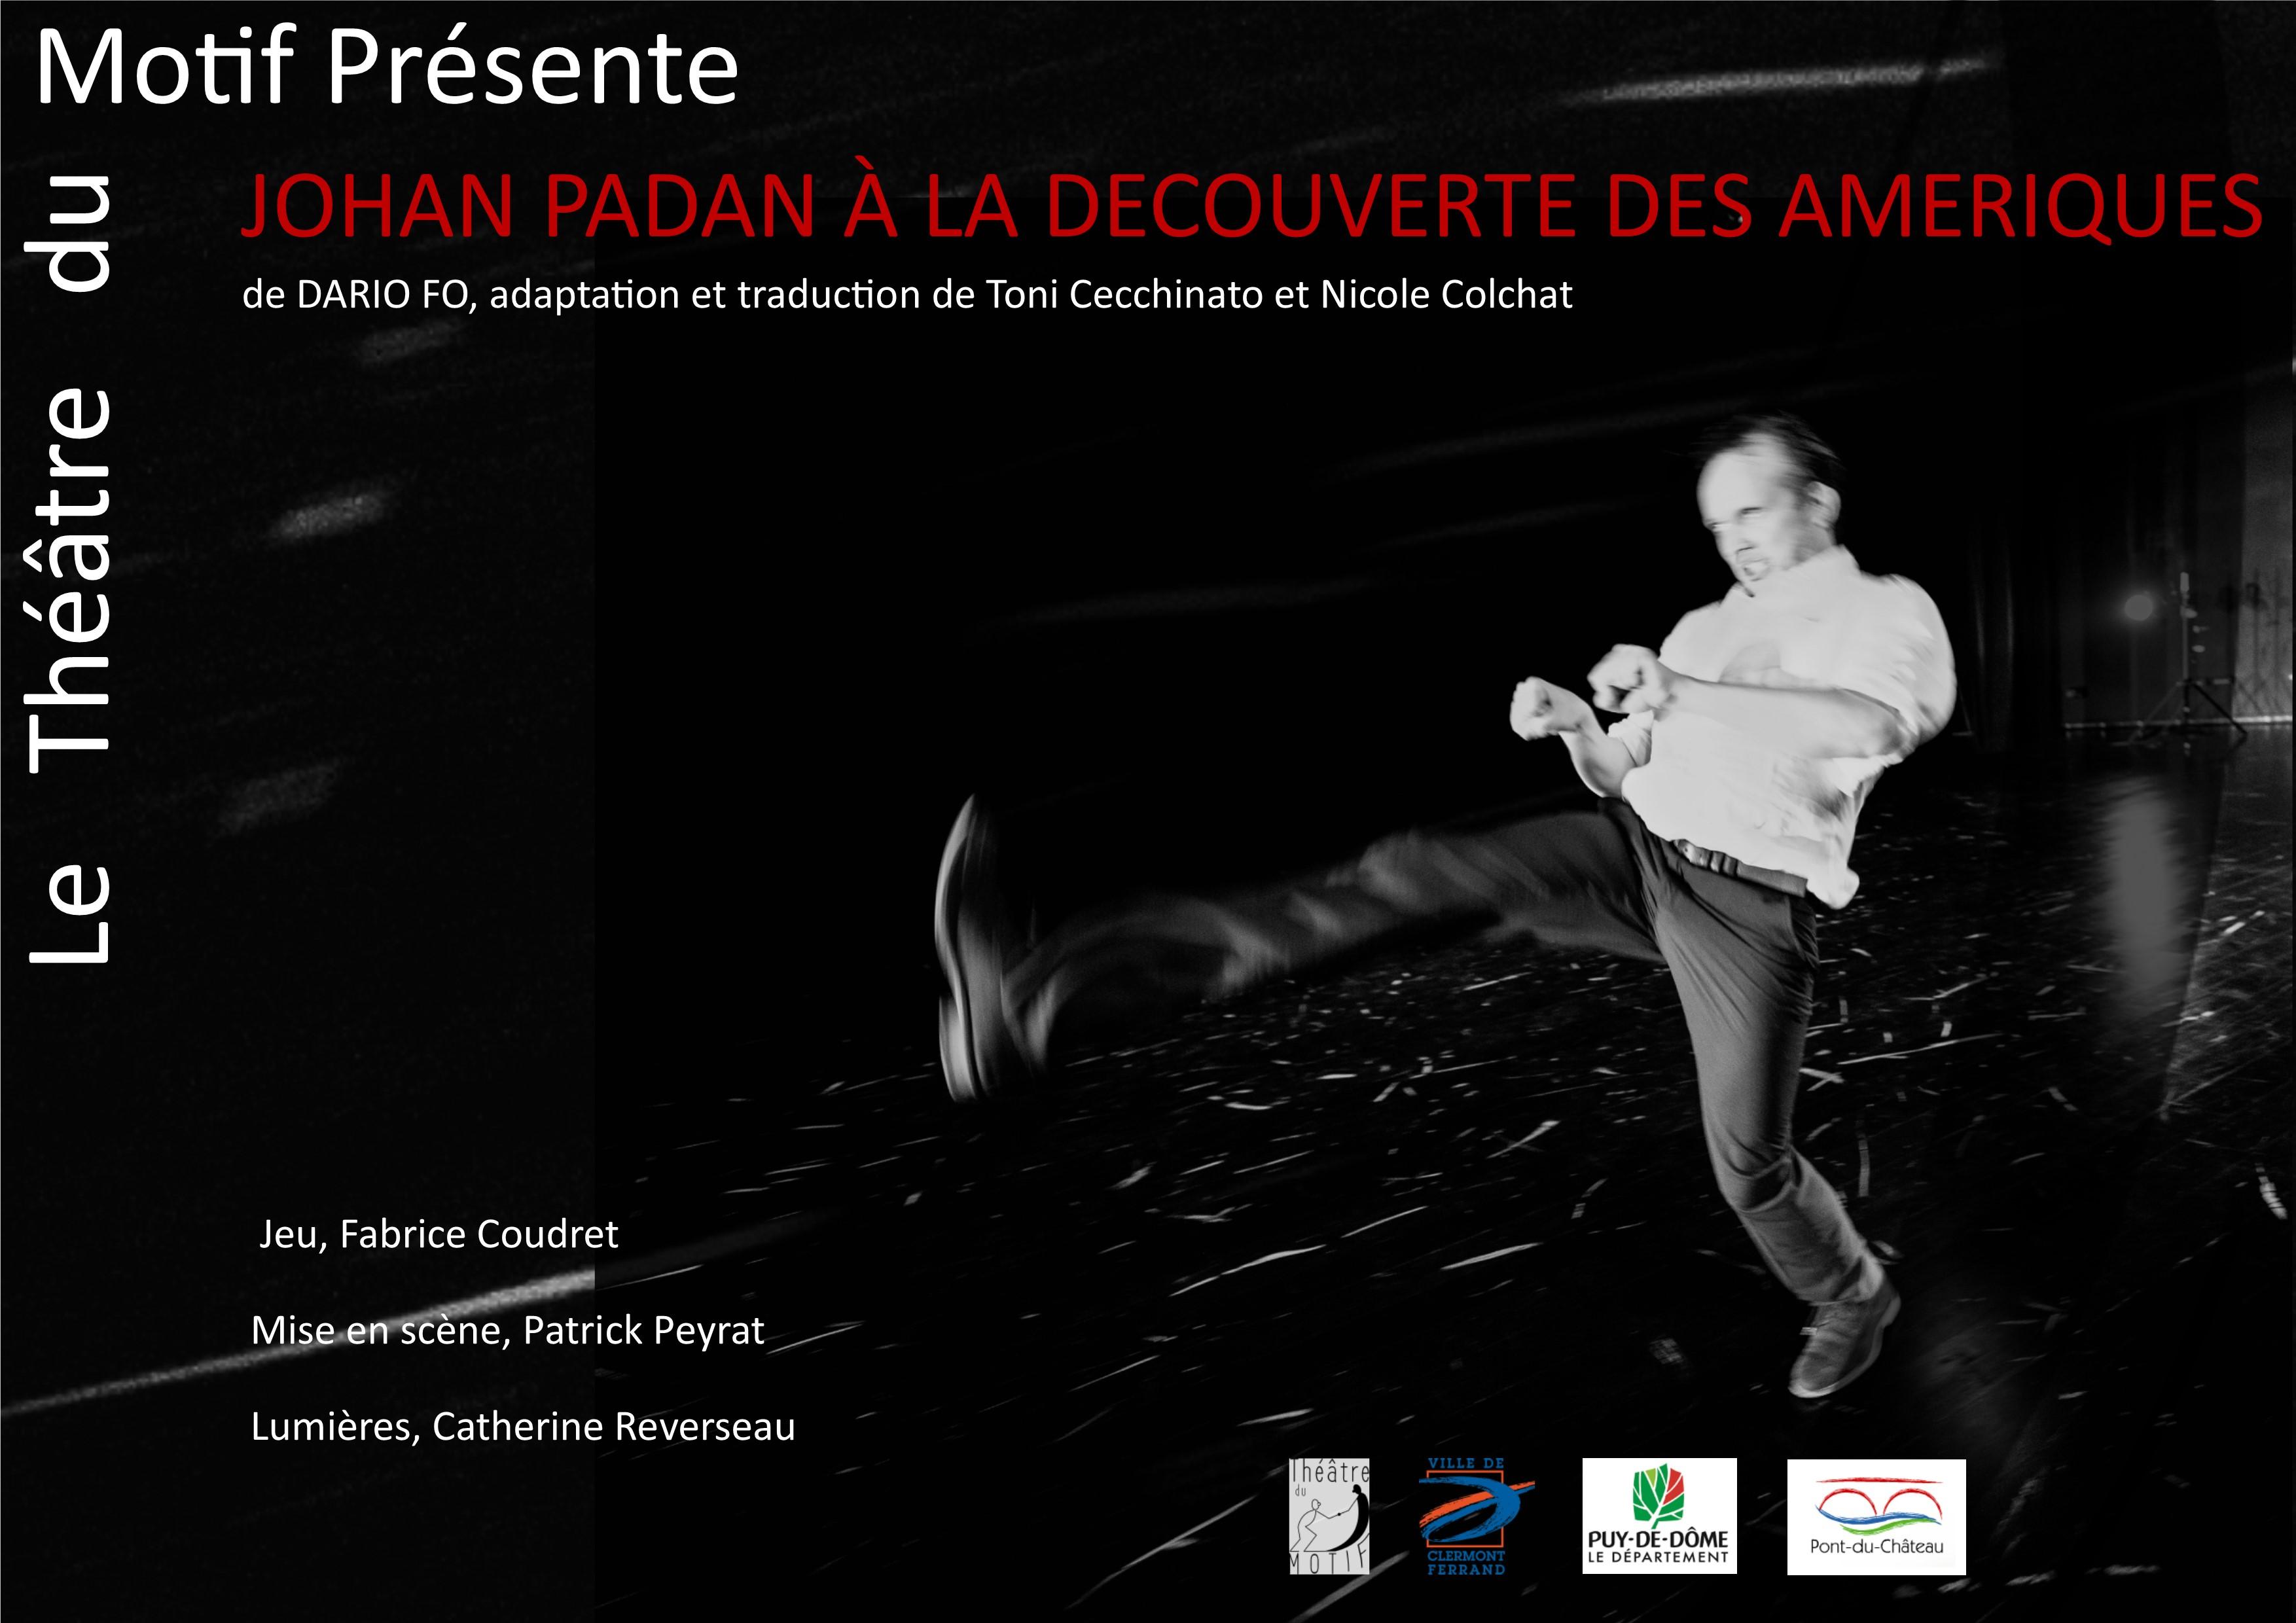 Calendrier Traduction.Calendrier Theatre Du Motif